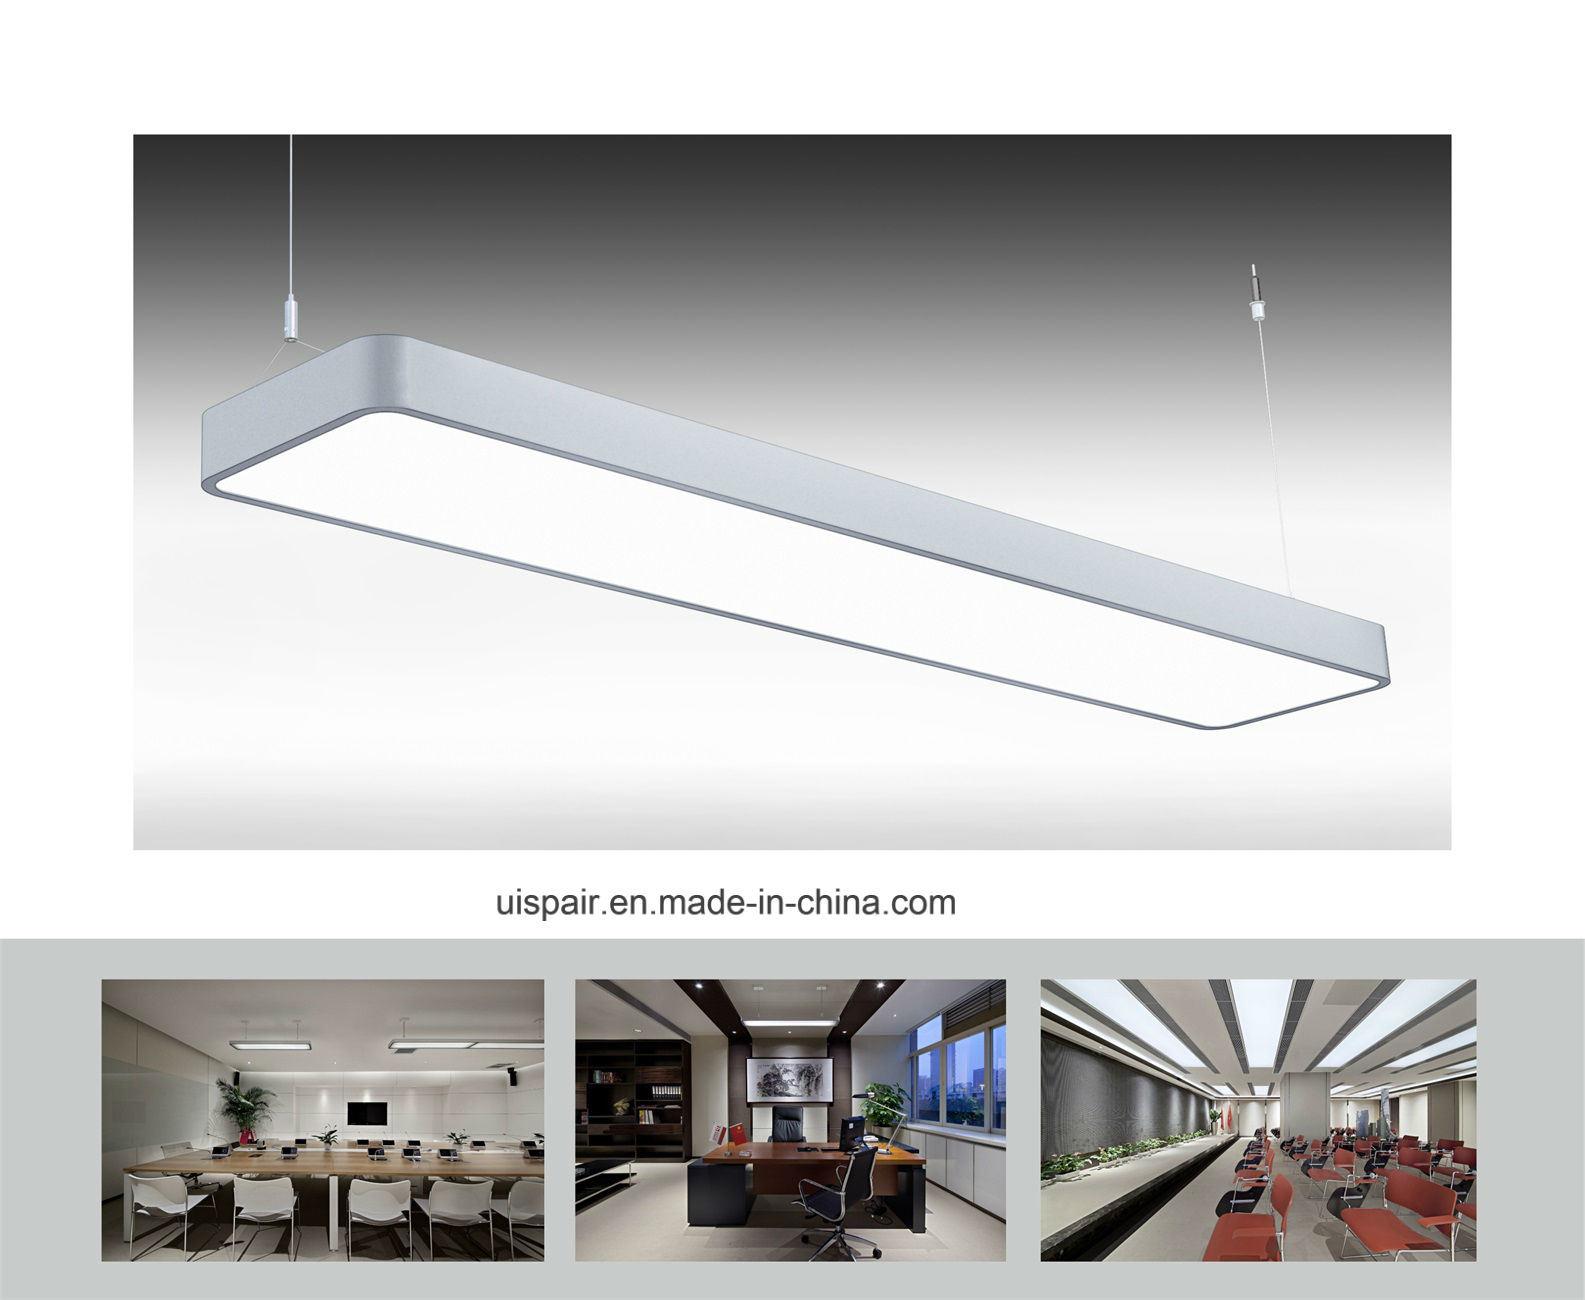 Uispair Modern Office 8W Steel Base Aluminium Alloy LED Hanging Lamp Pendant Lamp